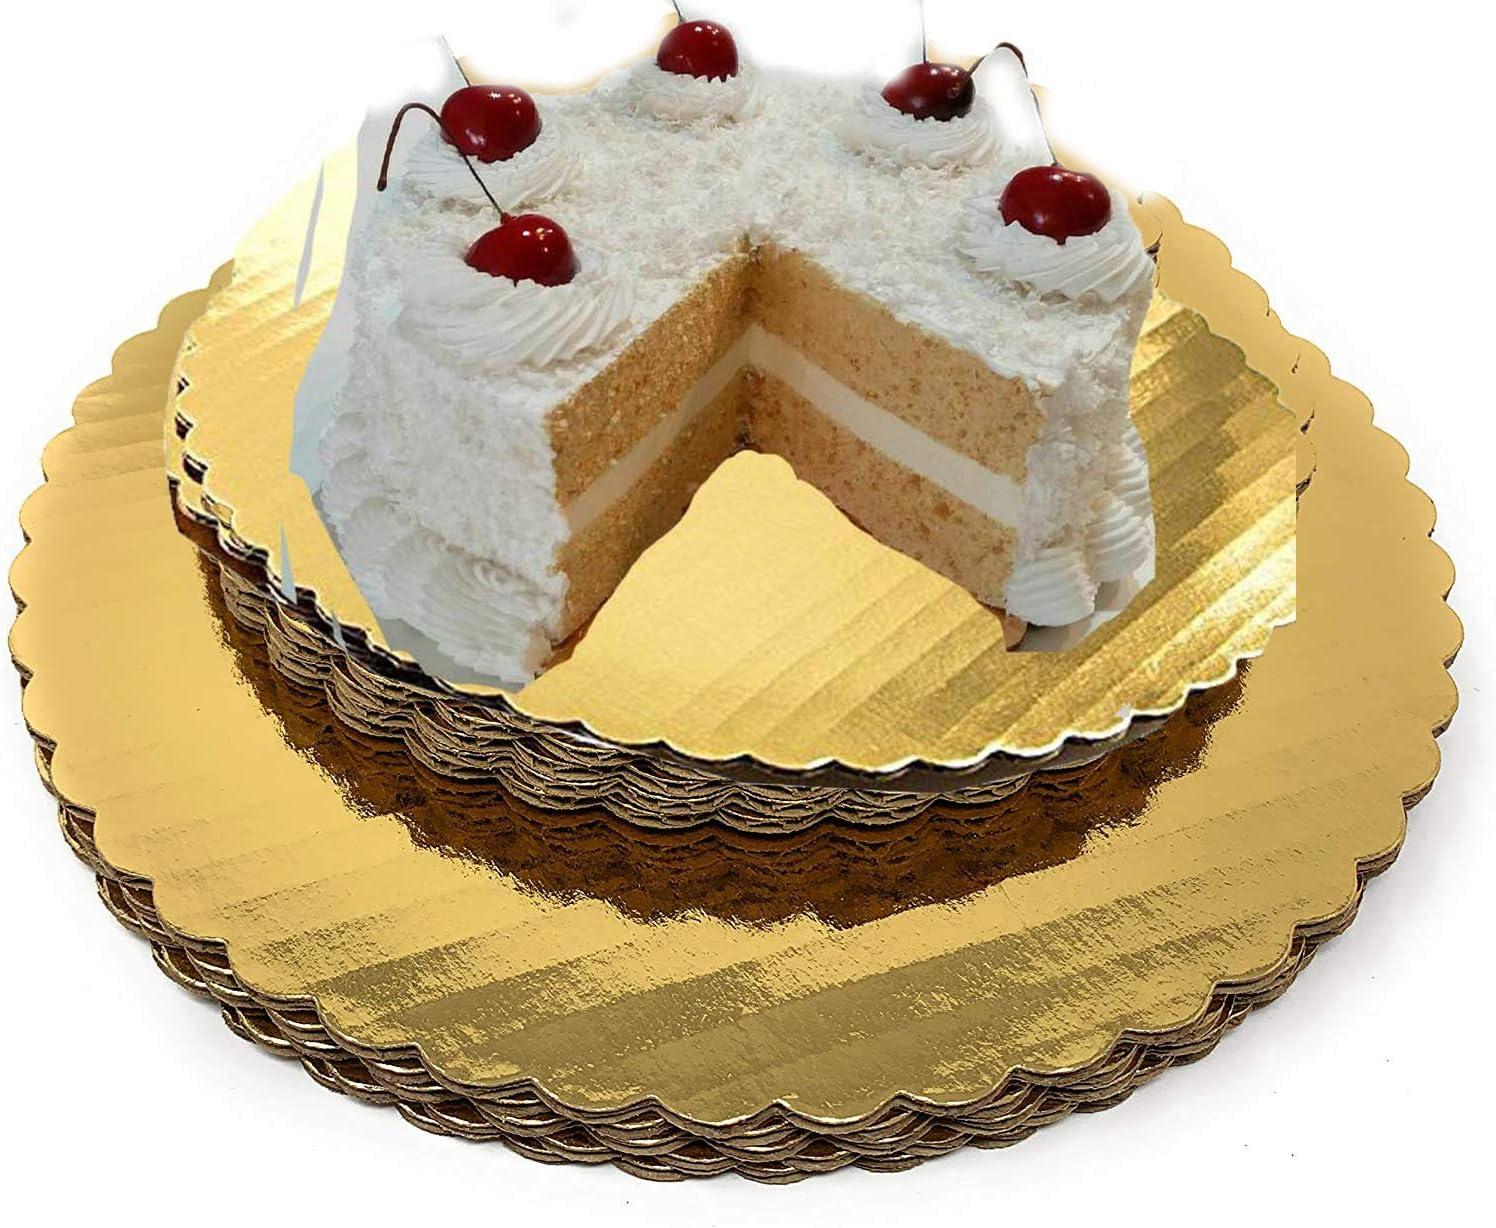 Cake Board Circle-gold Corrugated Cardboard, gold Cake Circle 100% Food Safe good for Cake(12